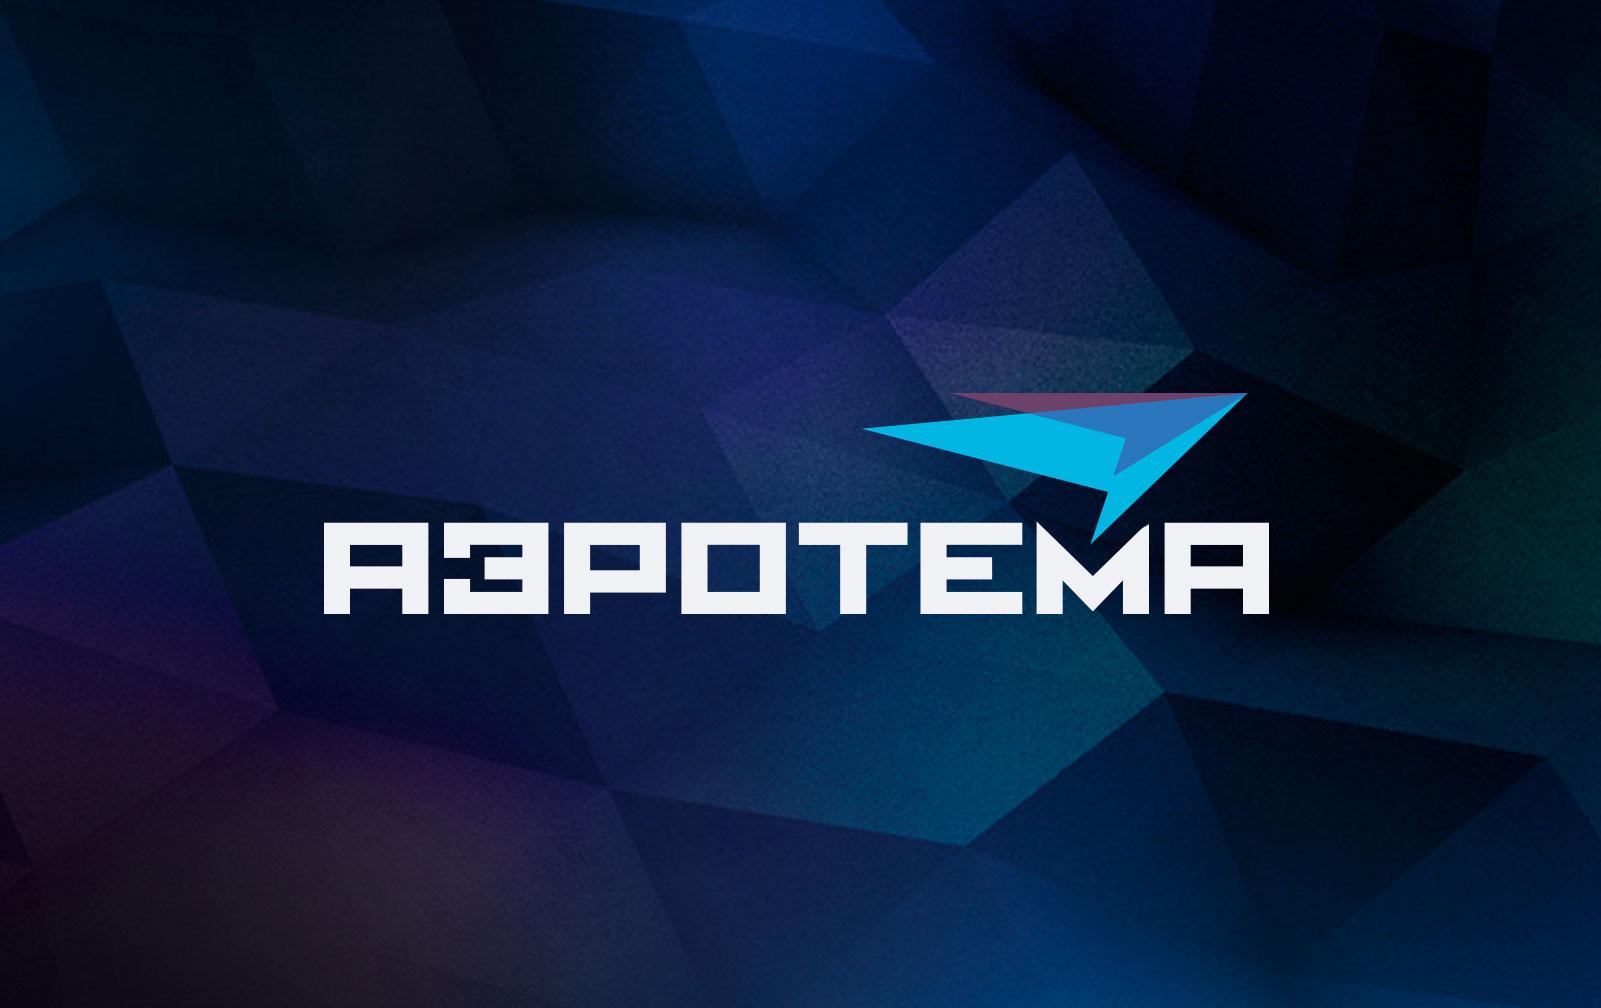 aerotema_logo_big